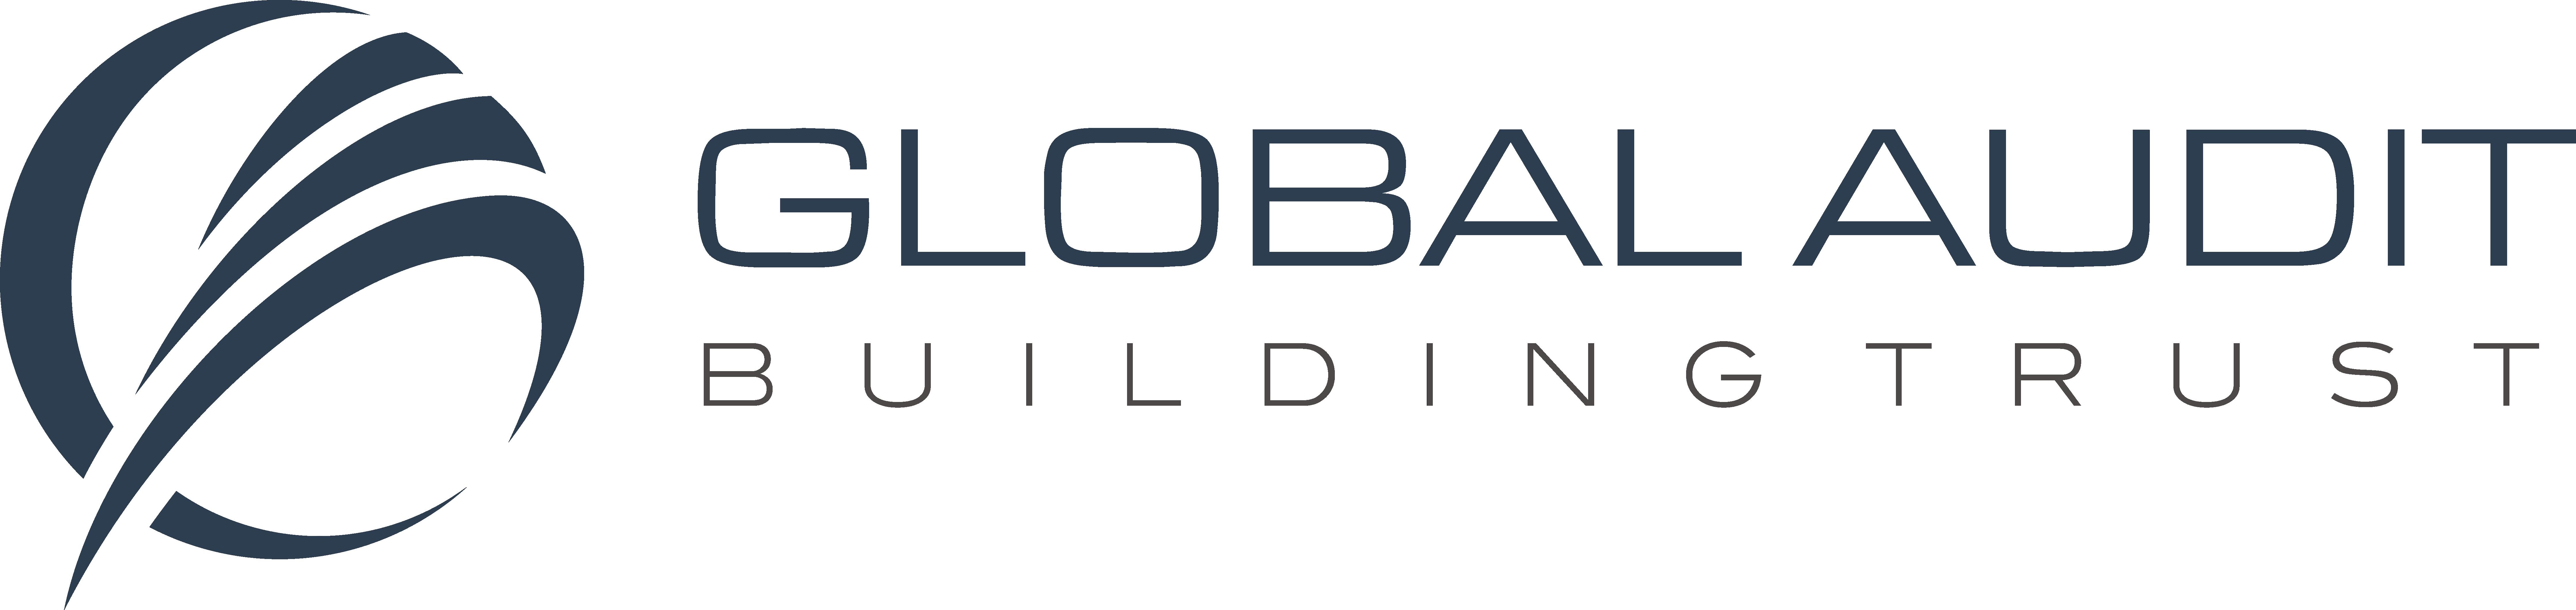 Global audit win new color 2 transparent background